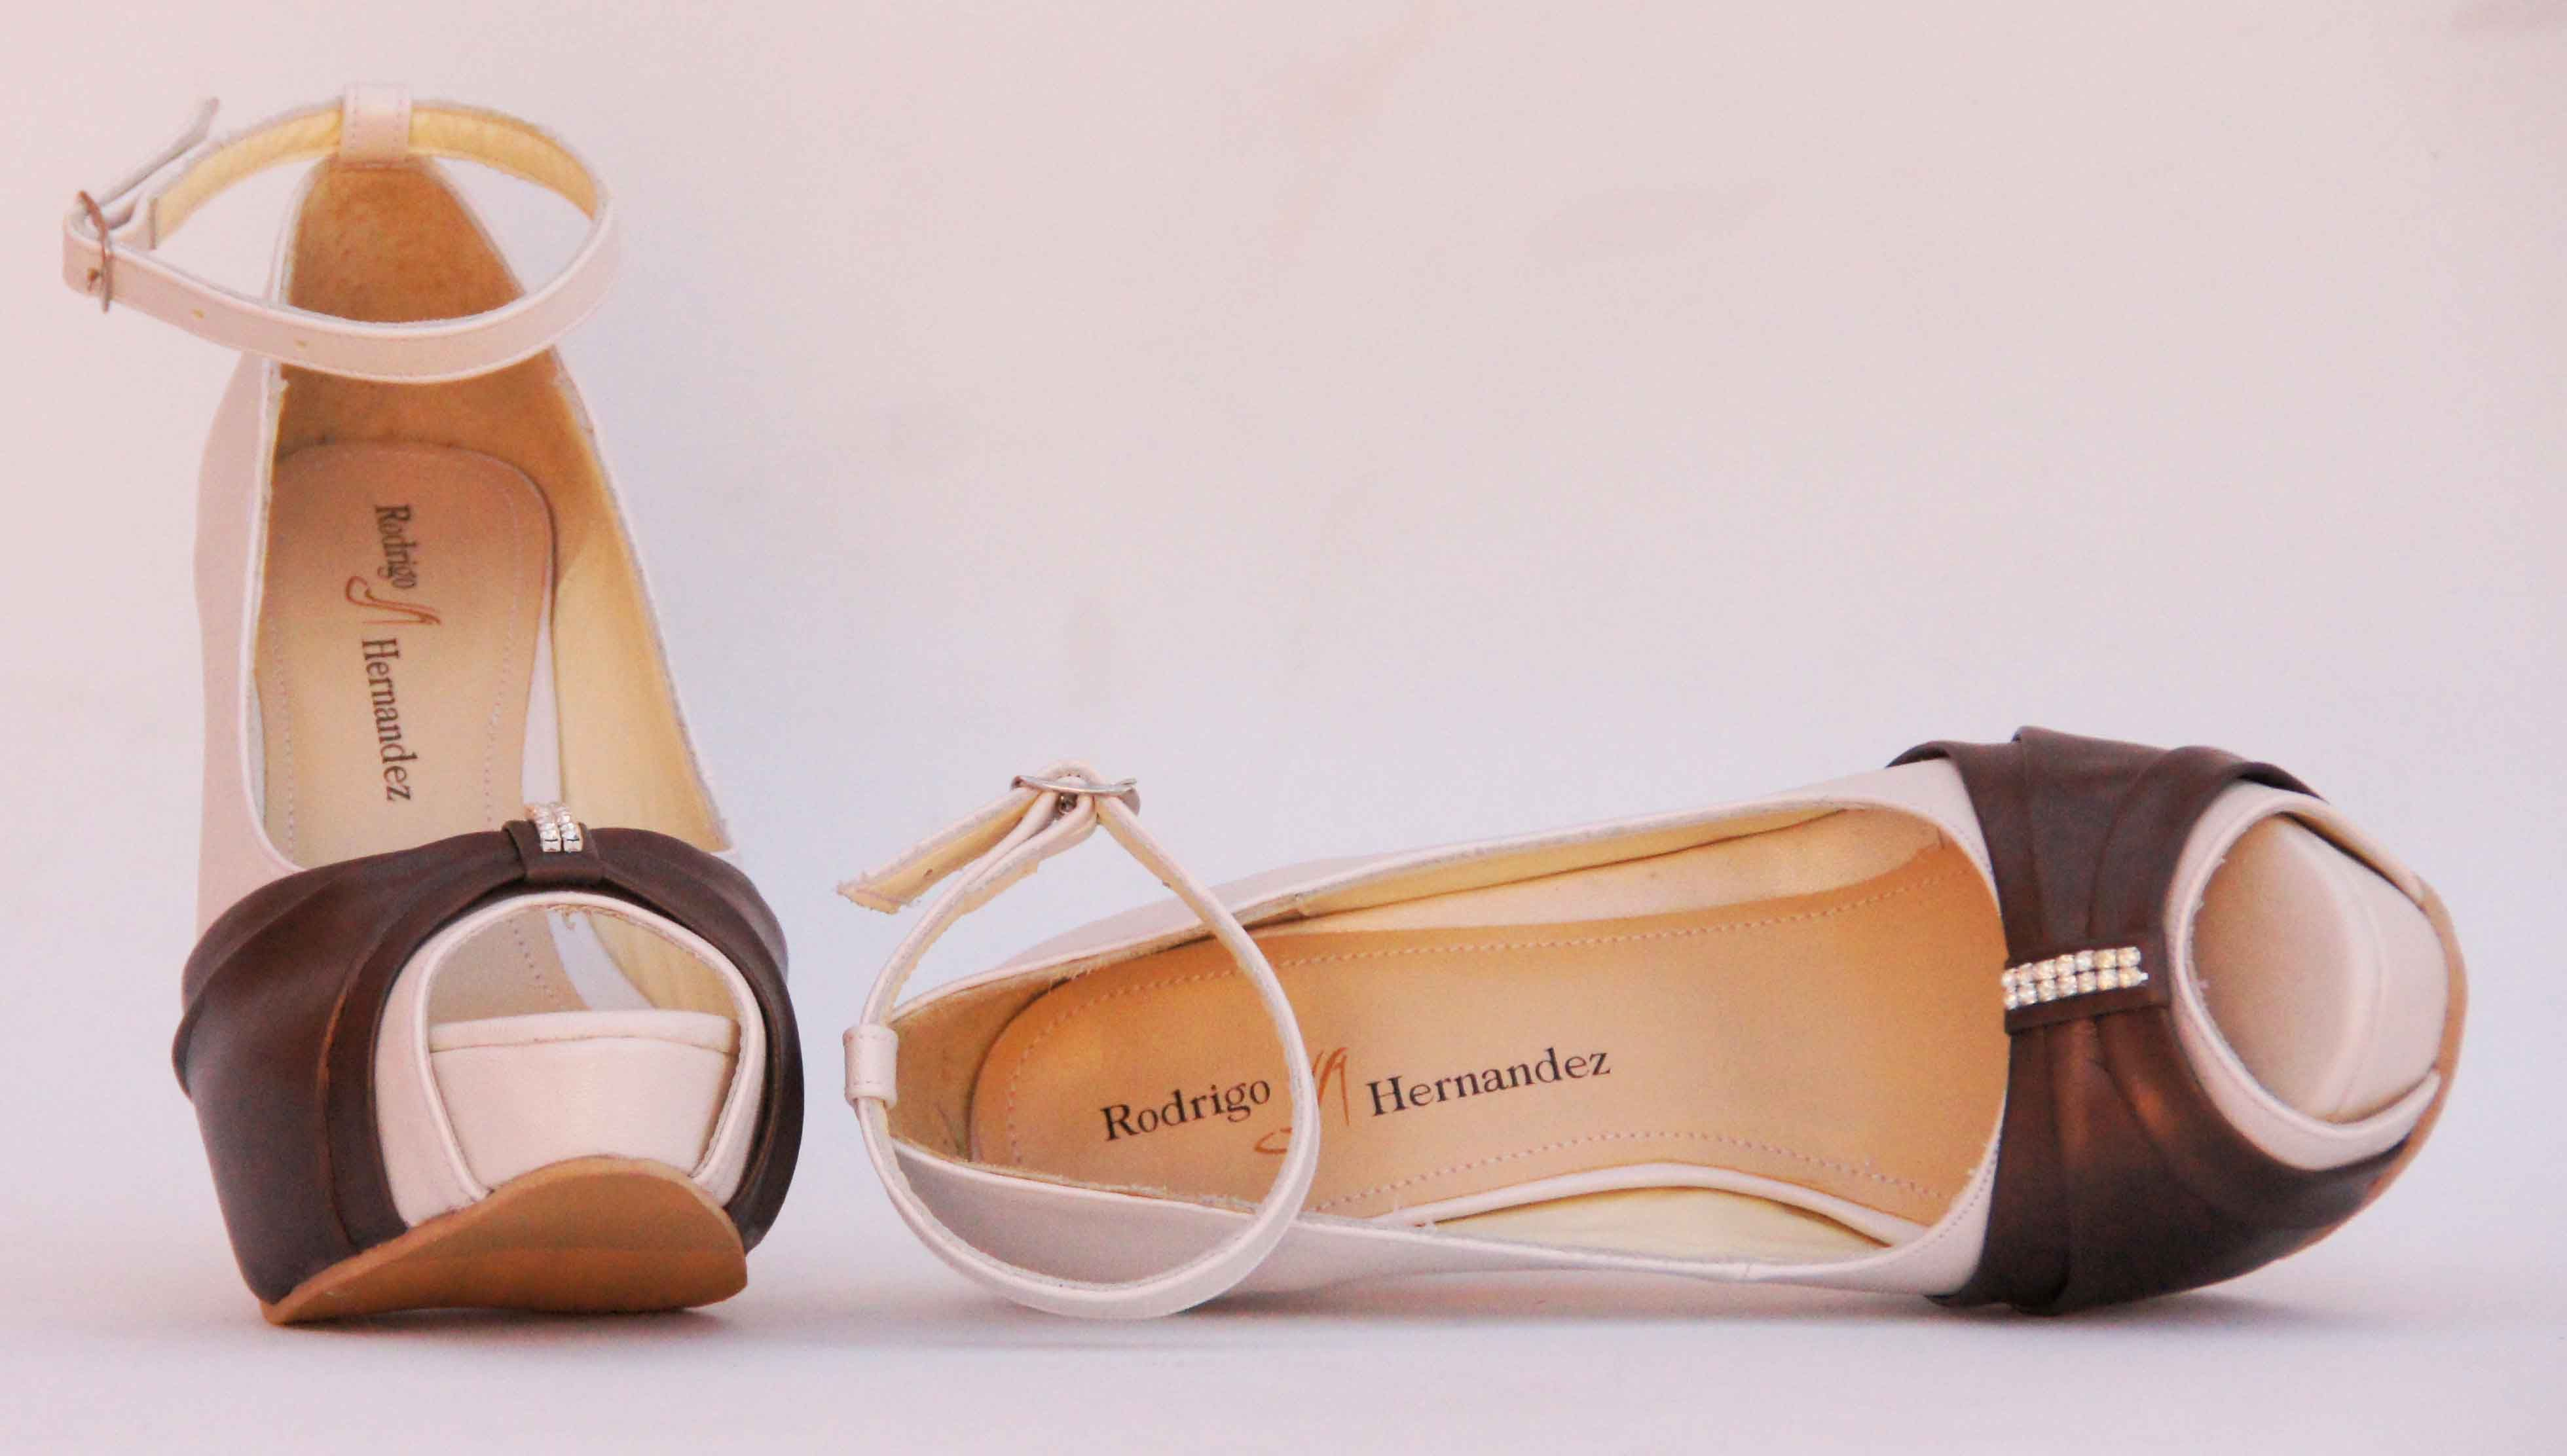 Zapatos de Novia, Rodrigo Hernández Color Blanco con Cafe Búscanos en Facebook Rodrigo Hernandez